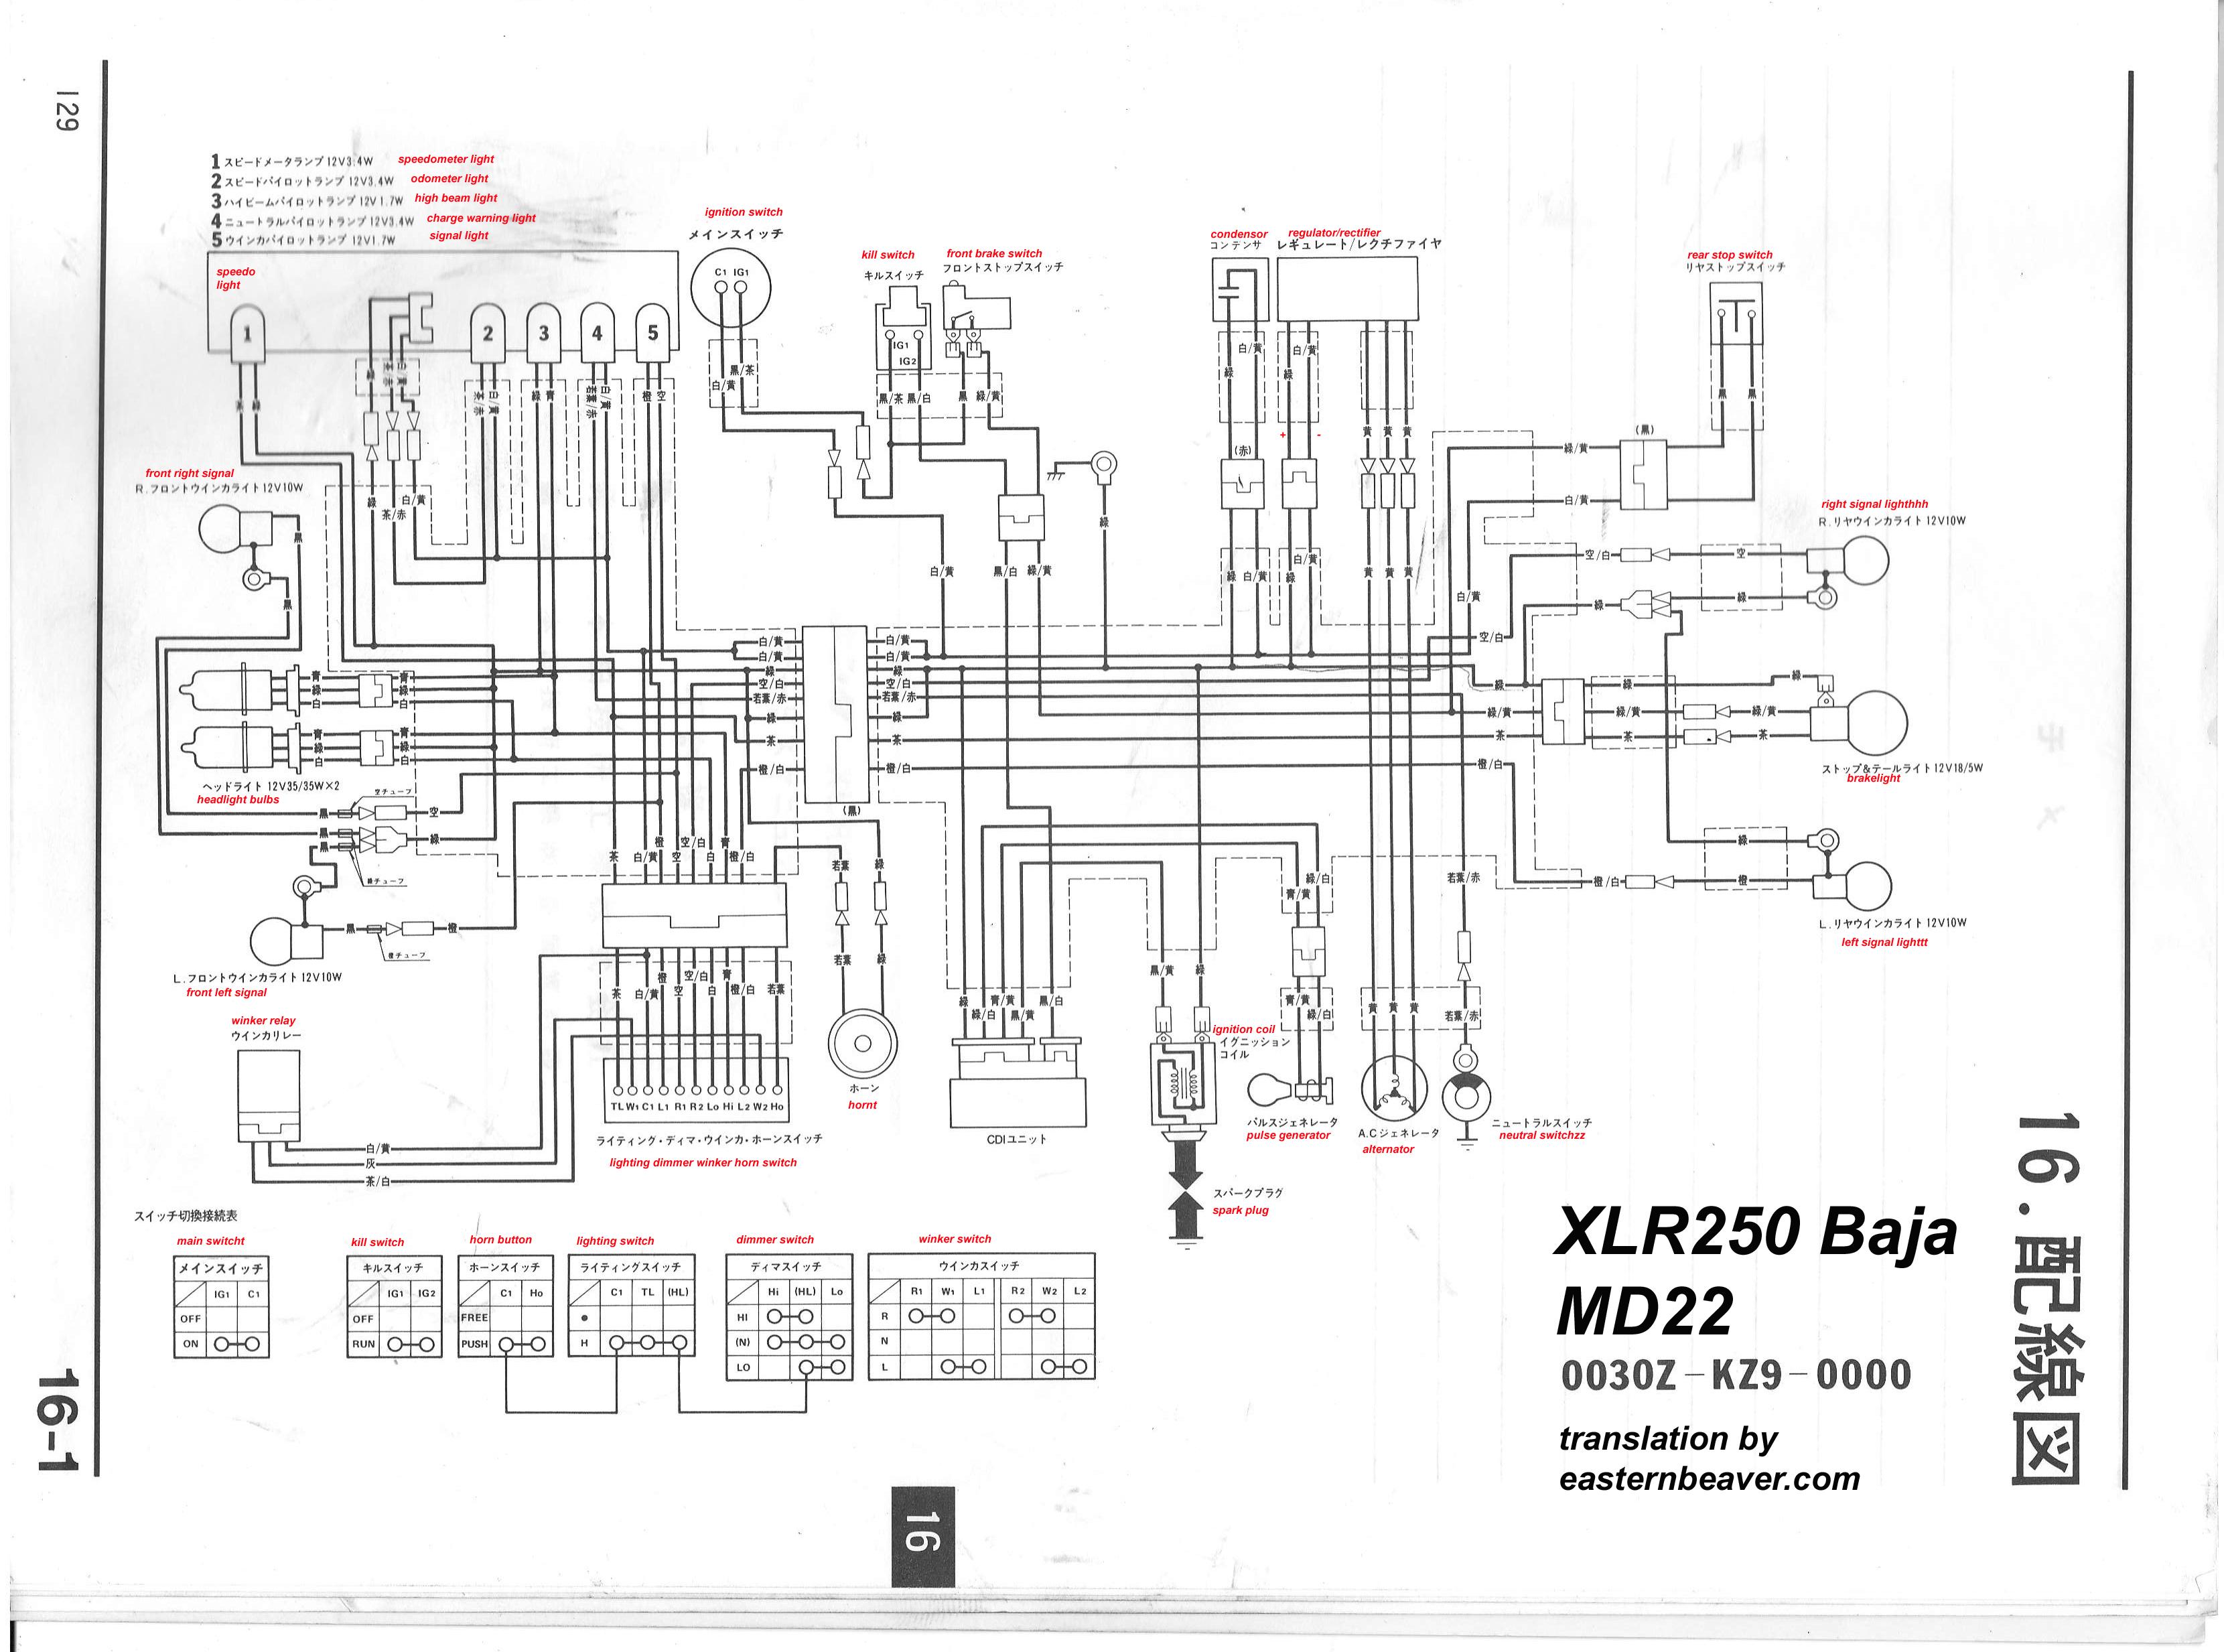 Swell Baja Designs Crf 230 Wiring Diagram General Wiring Diagram Data Wiring Cloud Biosomenaidewilluminateatxorg